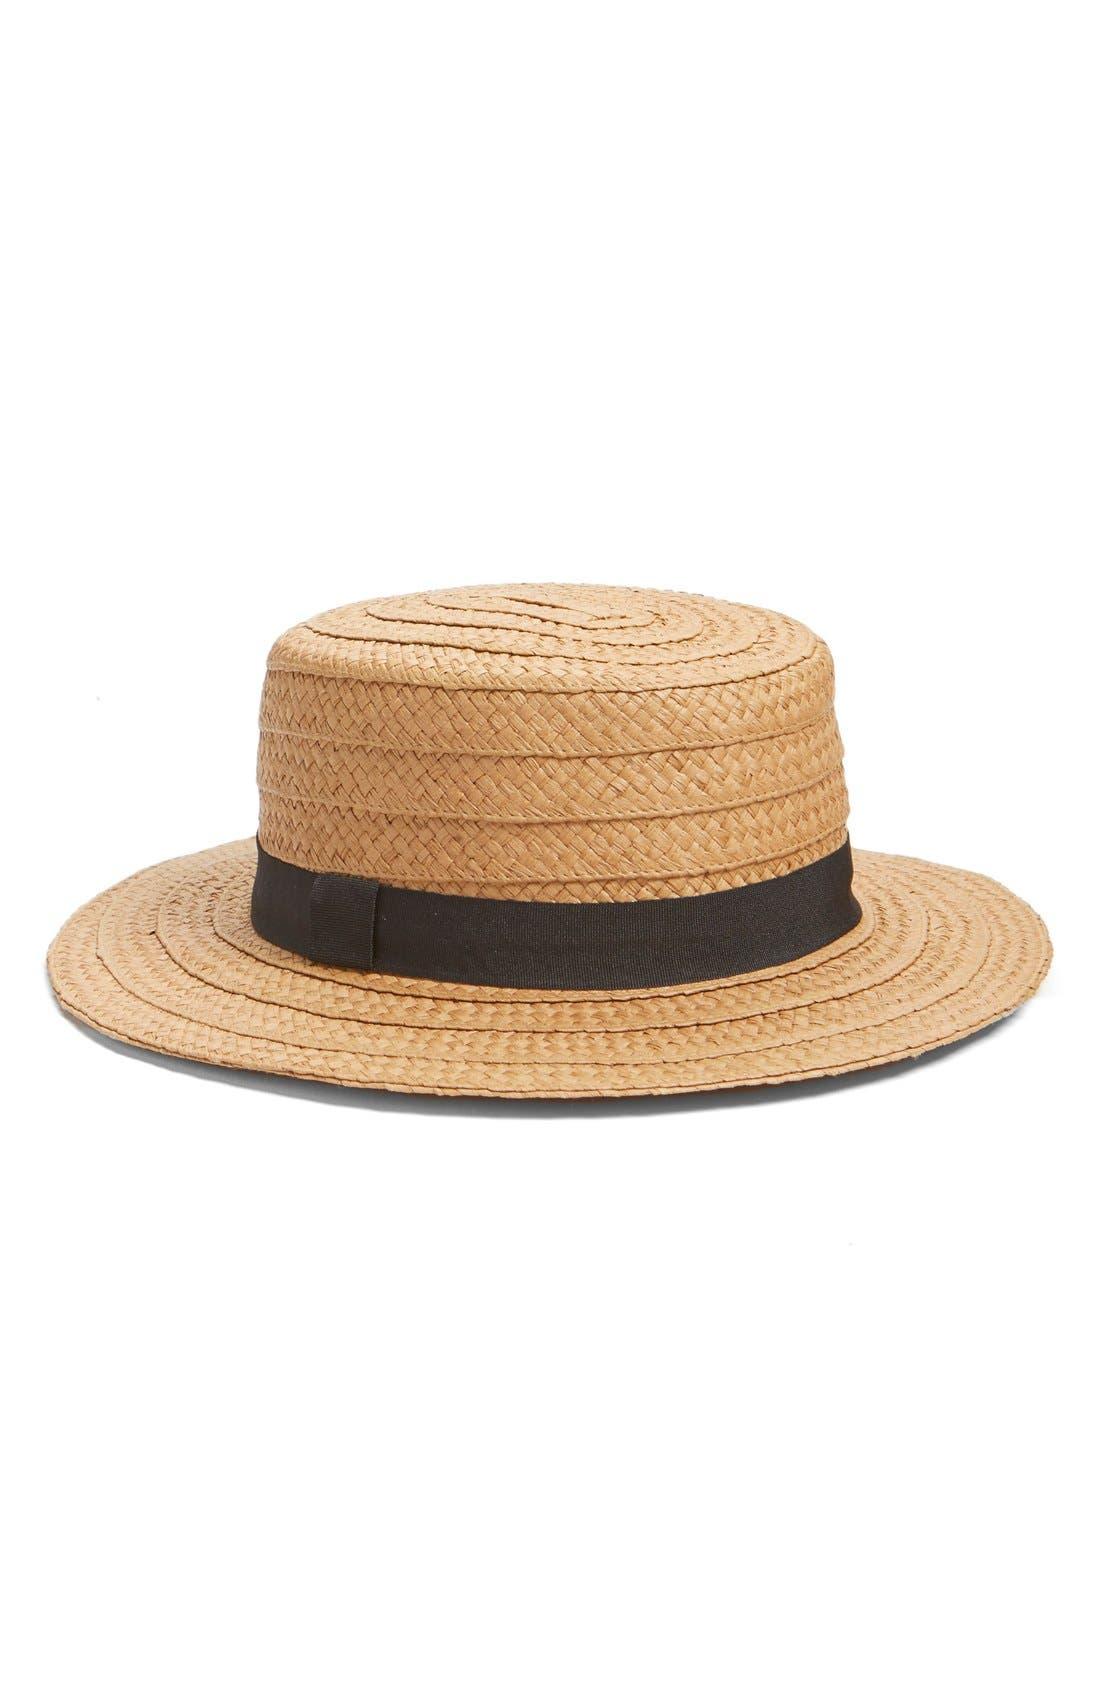 Alternate Image 1 Selected - Treasure & Bond Straw Boater Hat